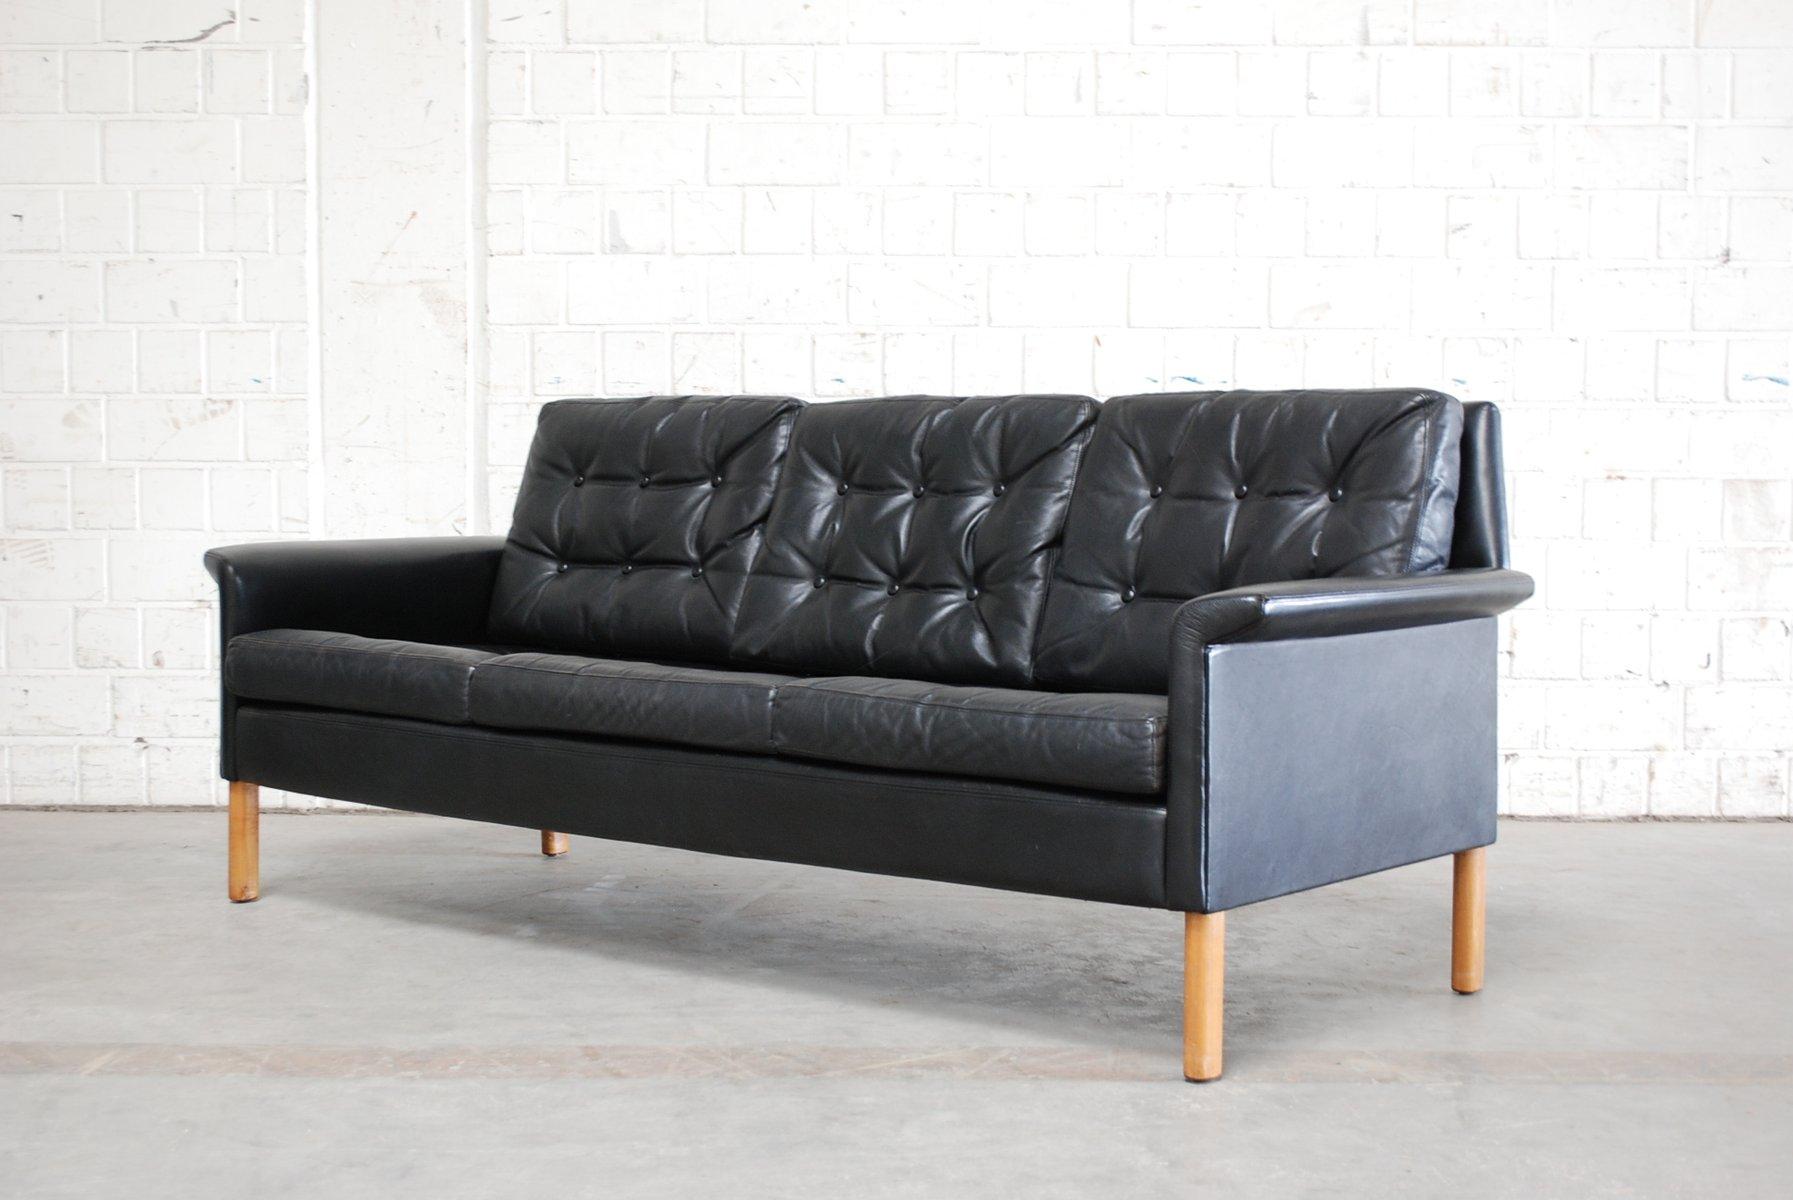 vintage sofa zwei sessel von rudolf glatzel f r kill. Black Bedroom Furniture Sets. Home Design Ideas